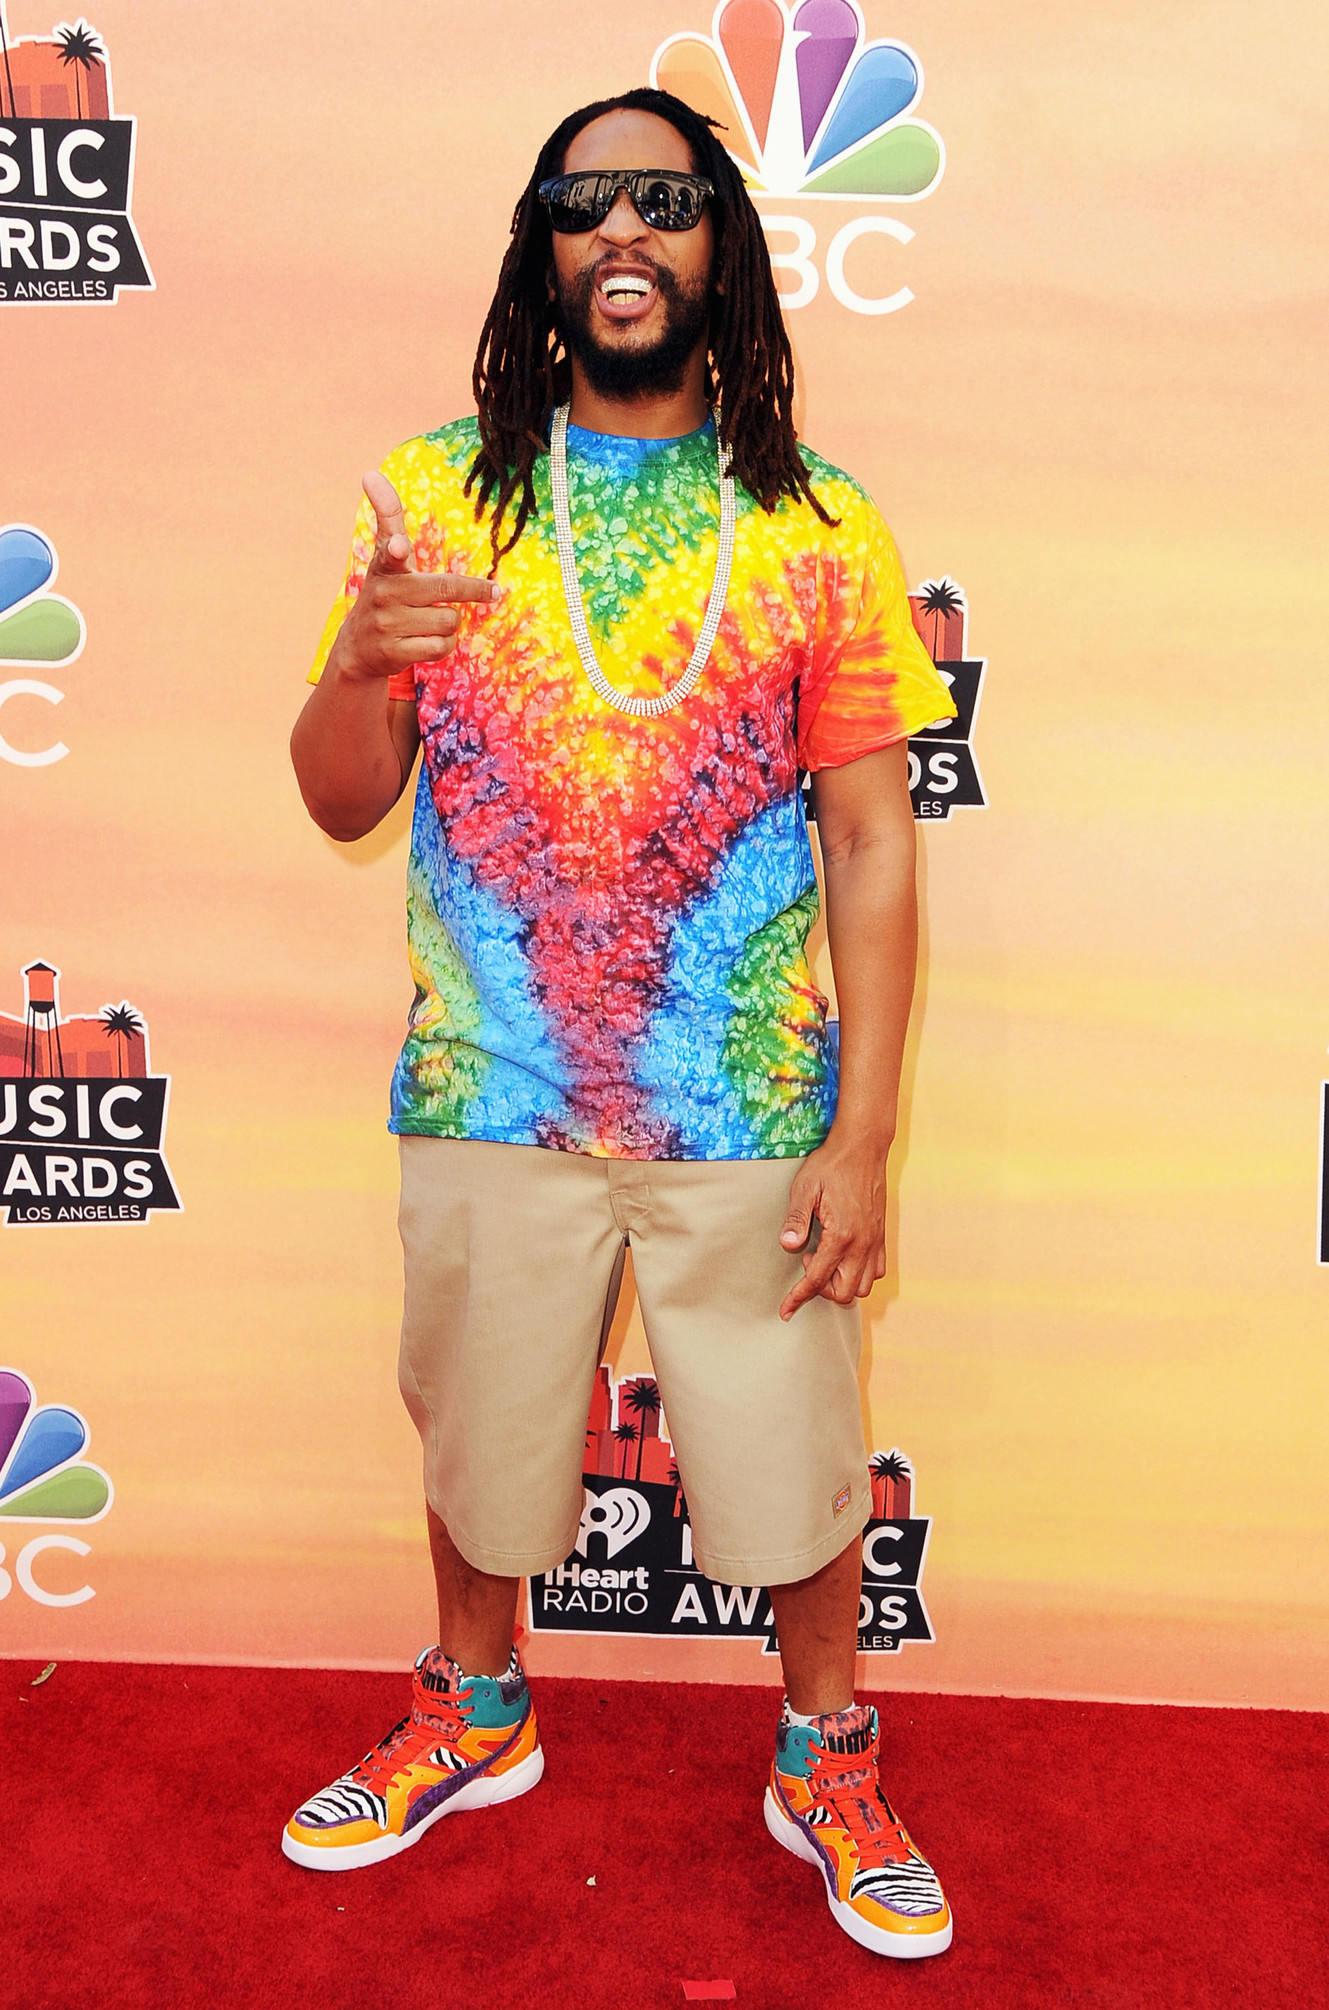 Lil Jon wearing a tie-dyed tshirt